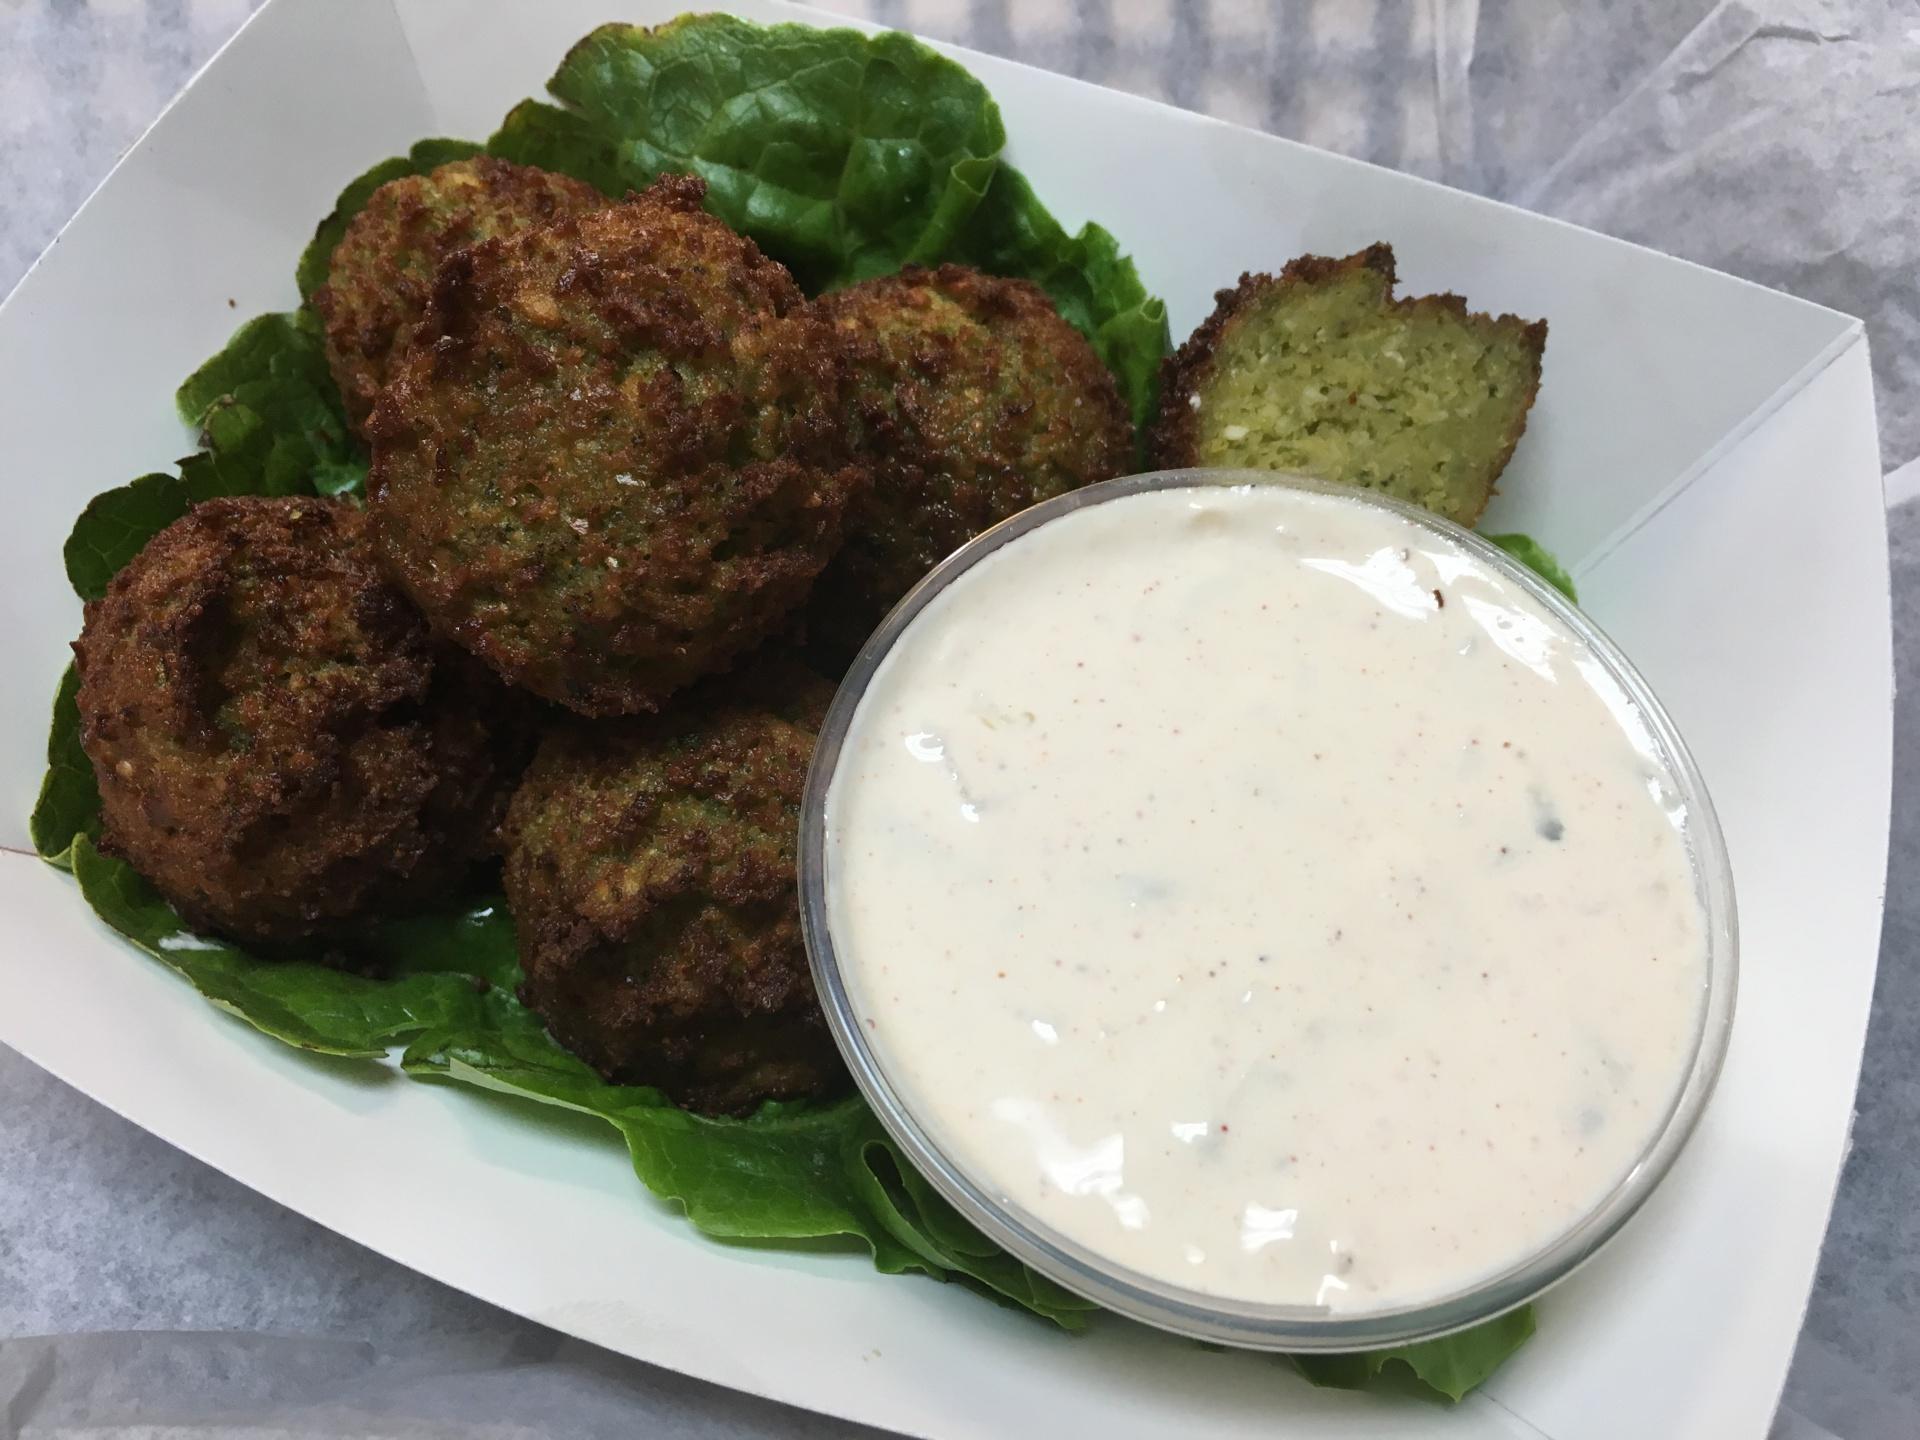 Falafel Appetizer with Tzatziki sauce